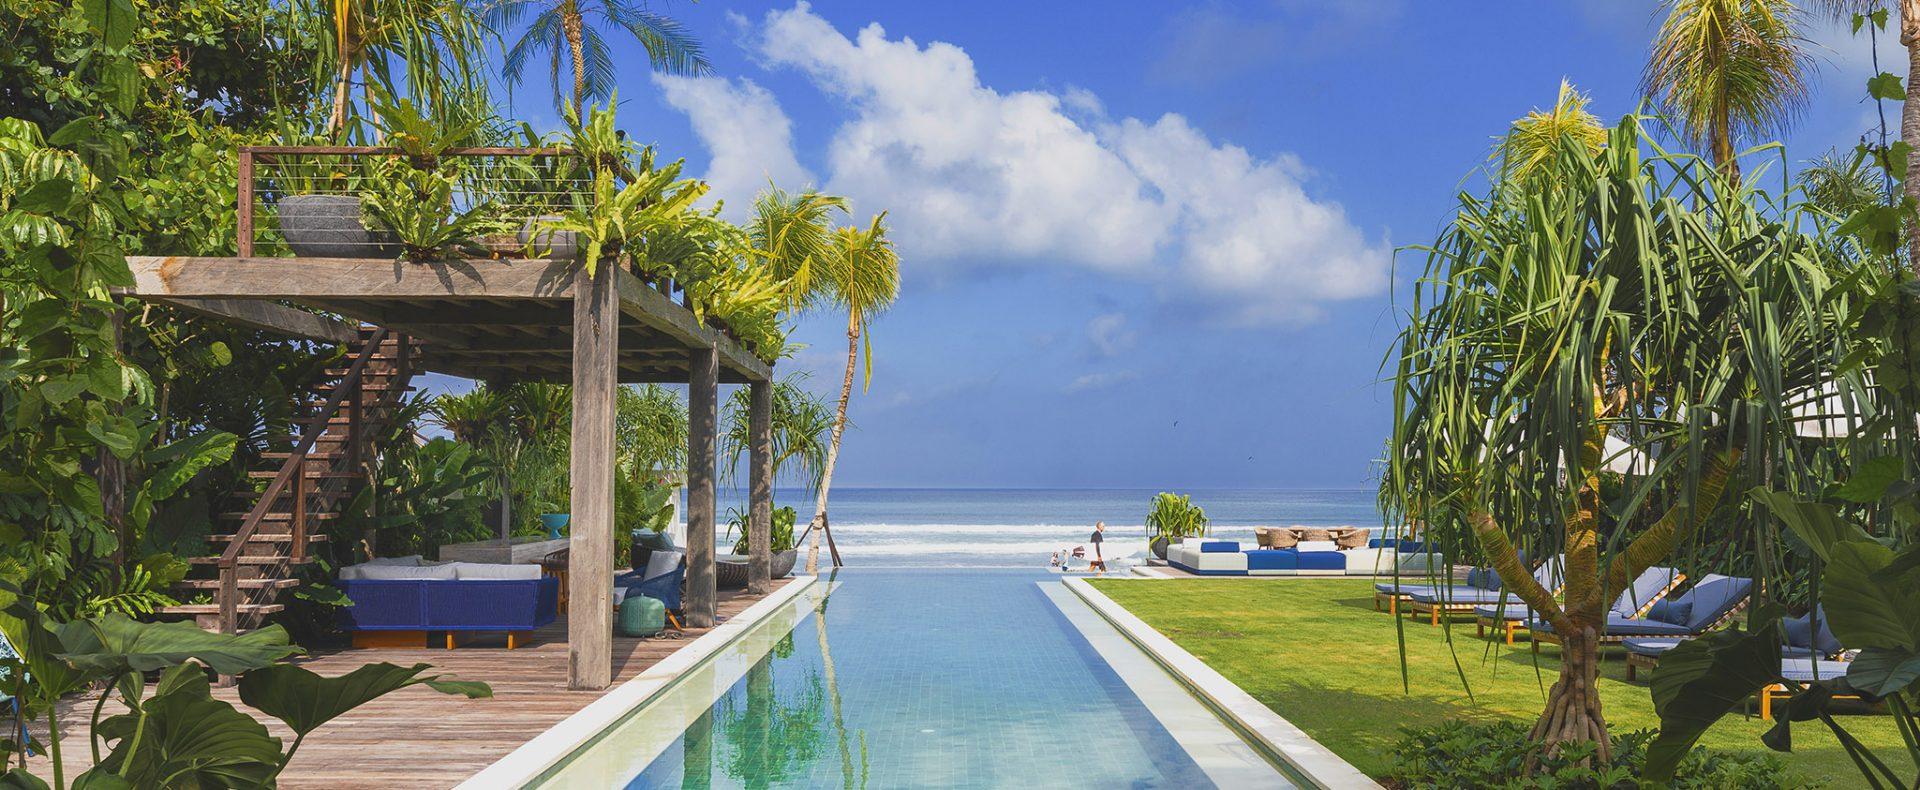 Noku Beach House - Bali Luxury Villas and High End Villa Rentals